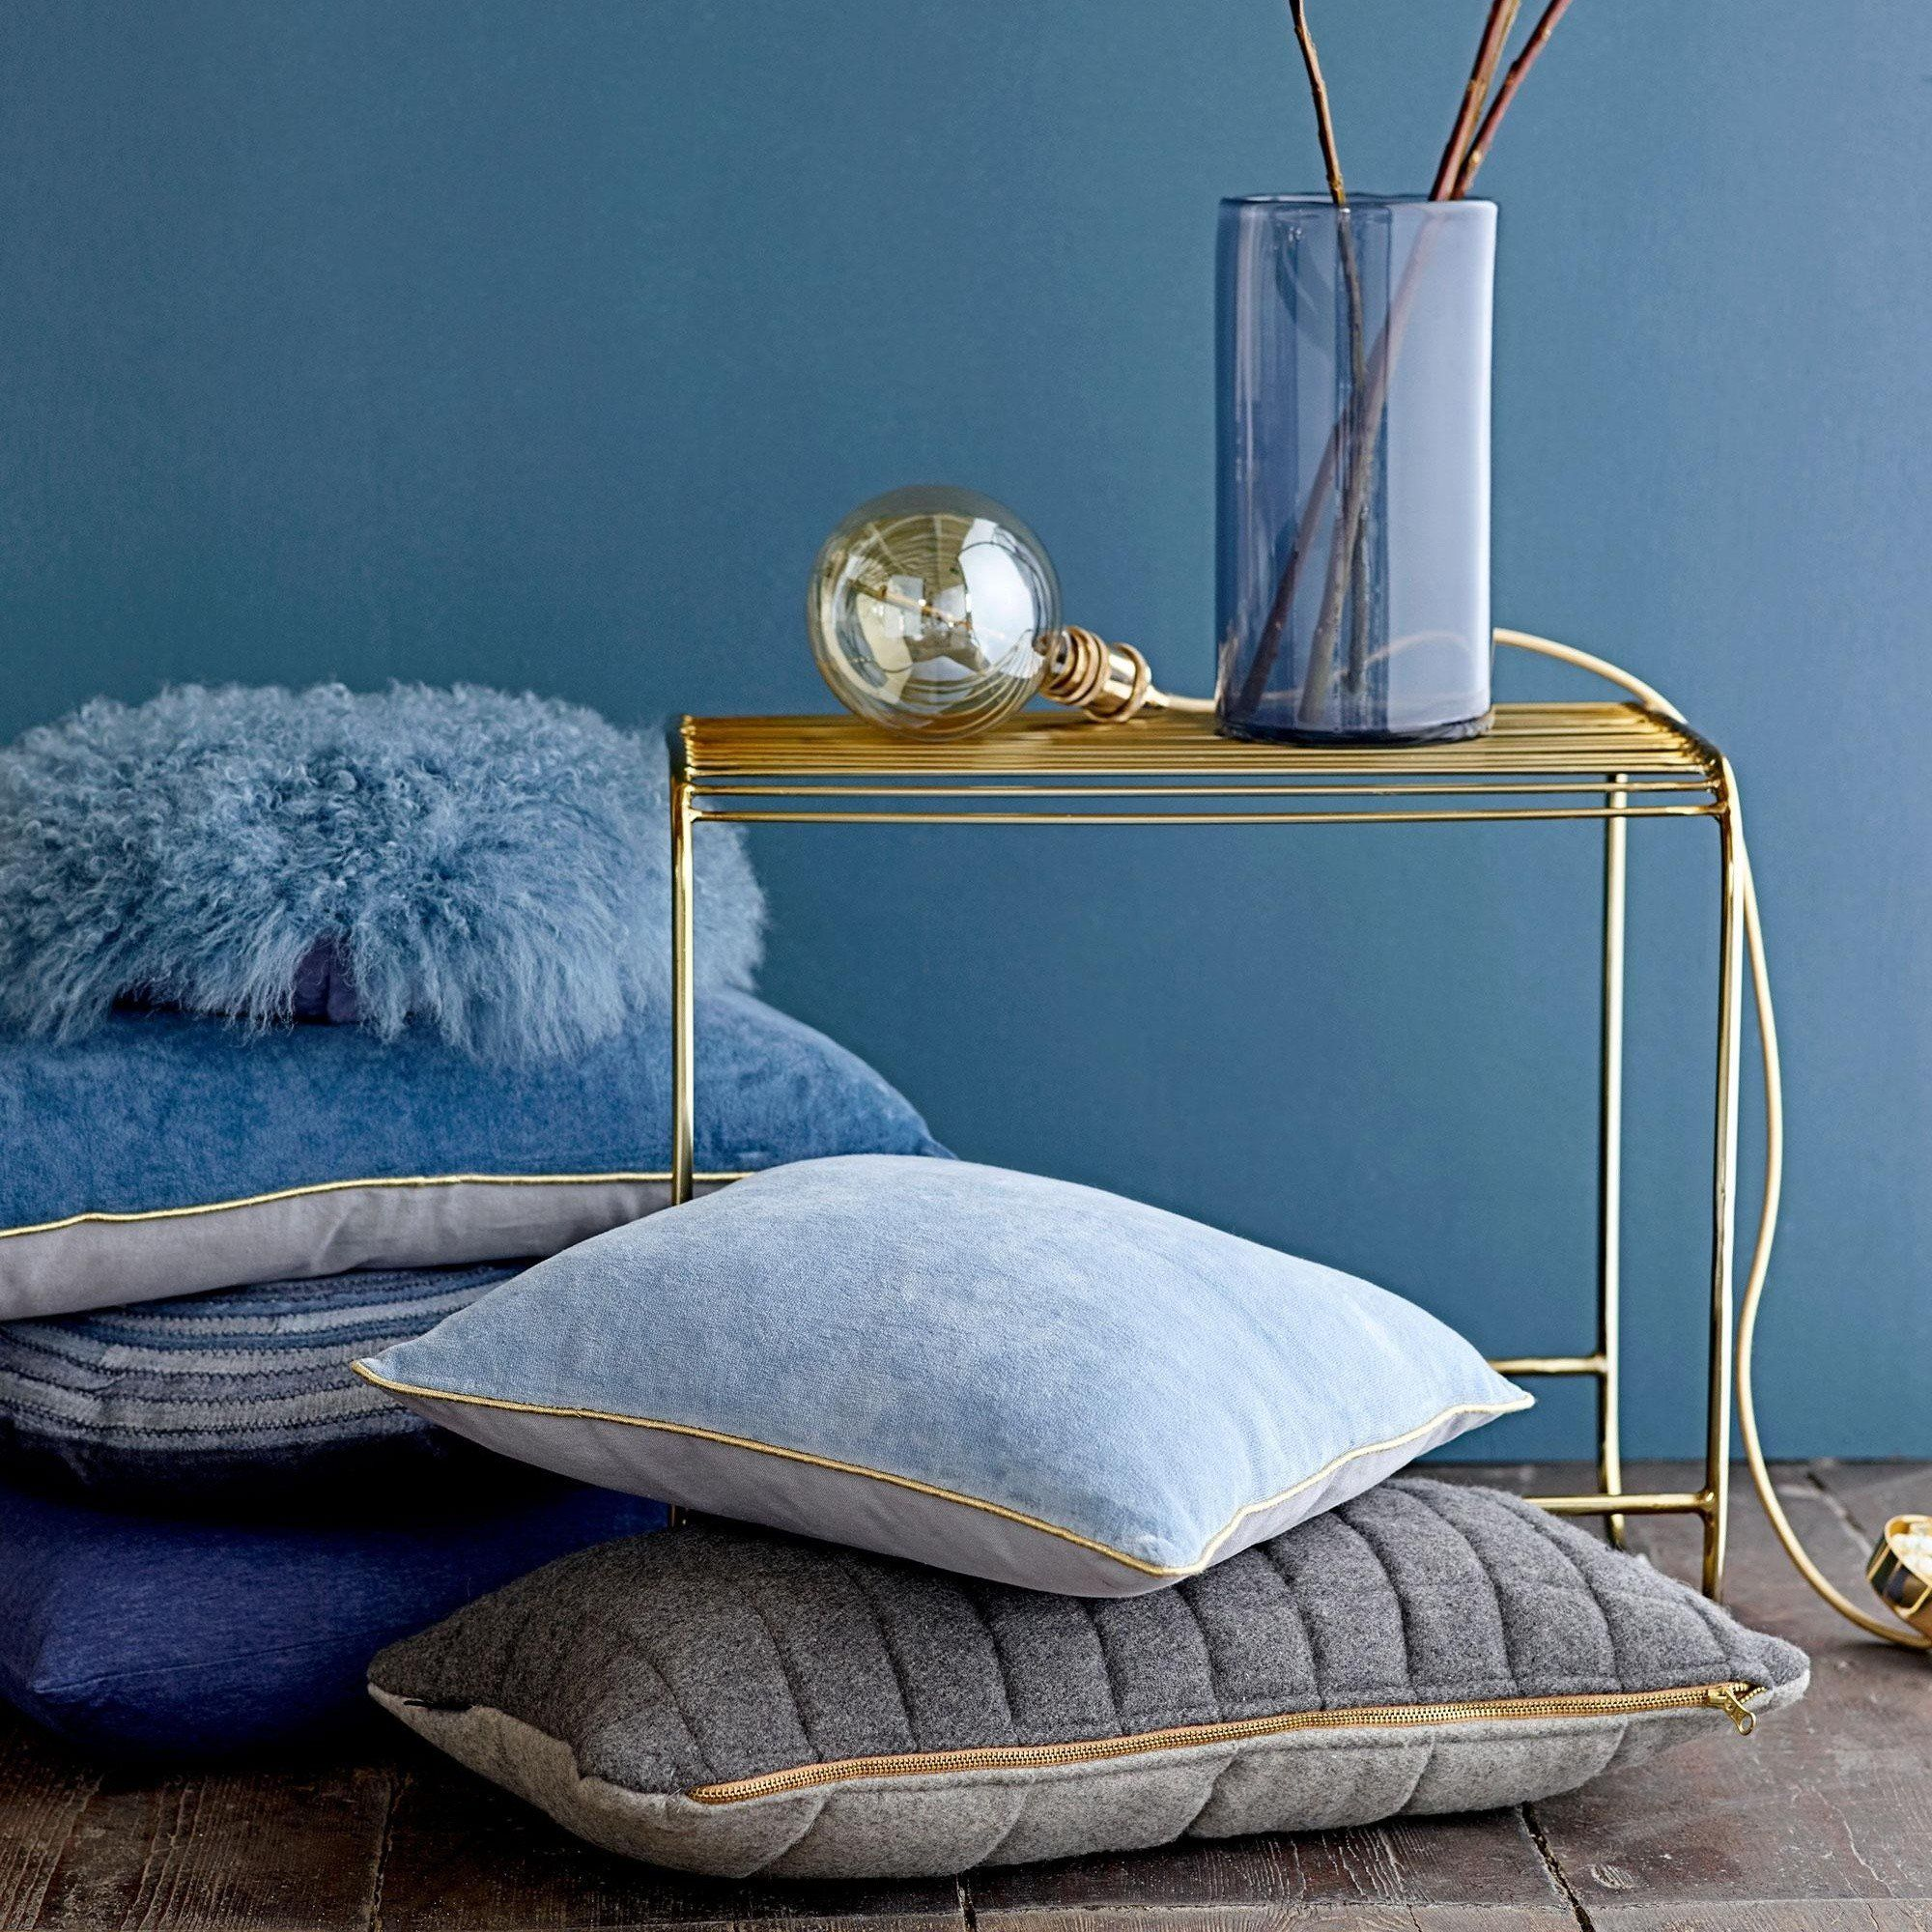 bloomingville hocker beistelltisch bloomingville. Black Bedroom Furniture Sets. Home Design Ideas